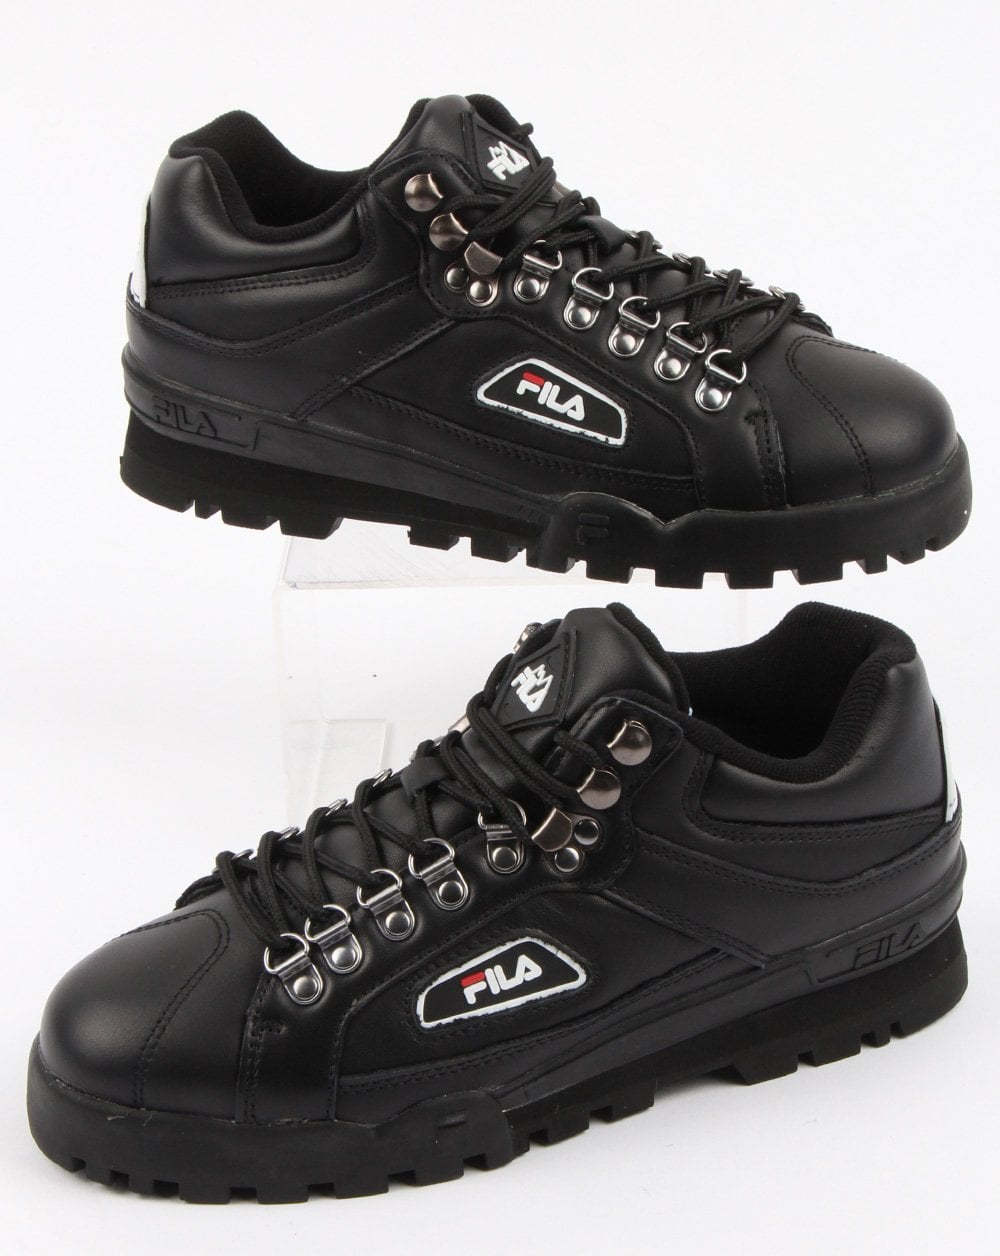 Fila Vintage Trailblazer Hiking Boots